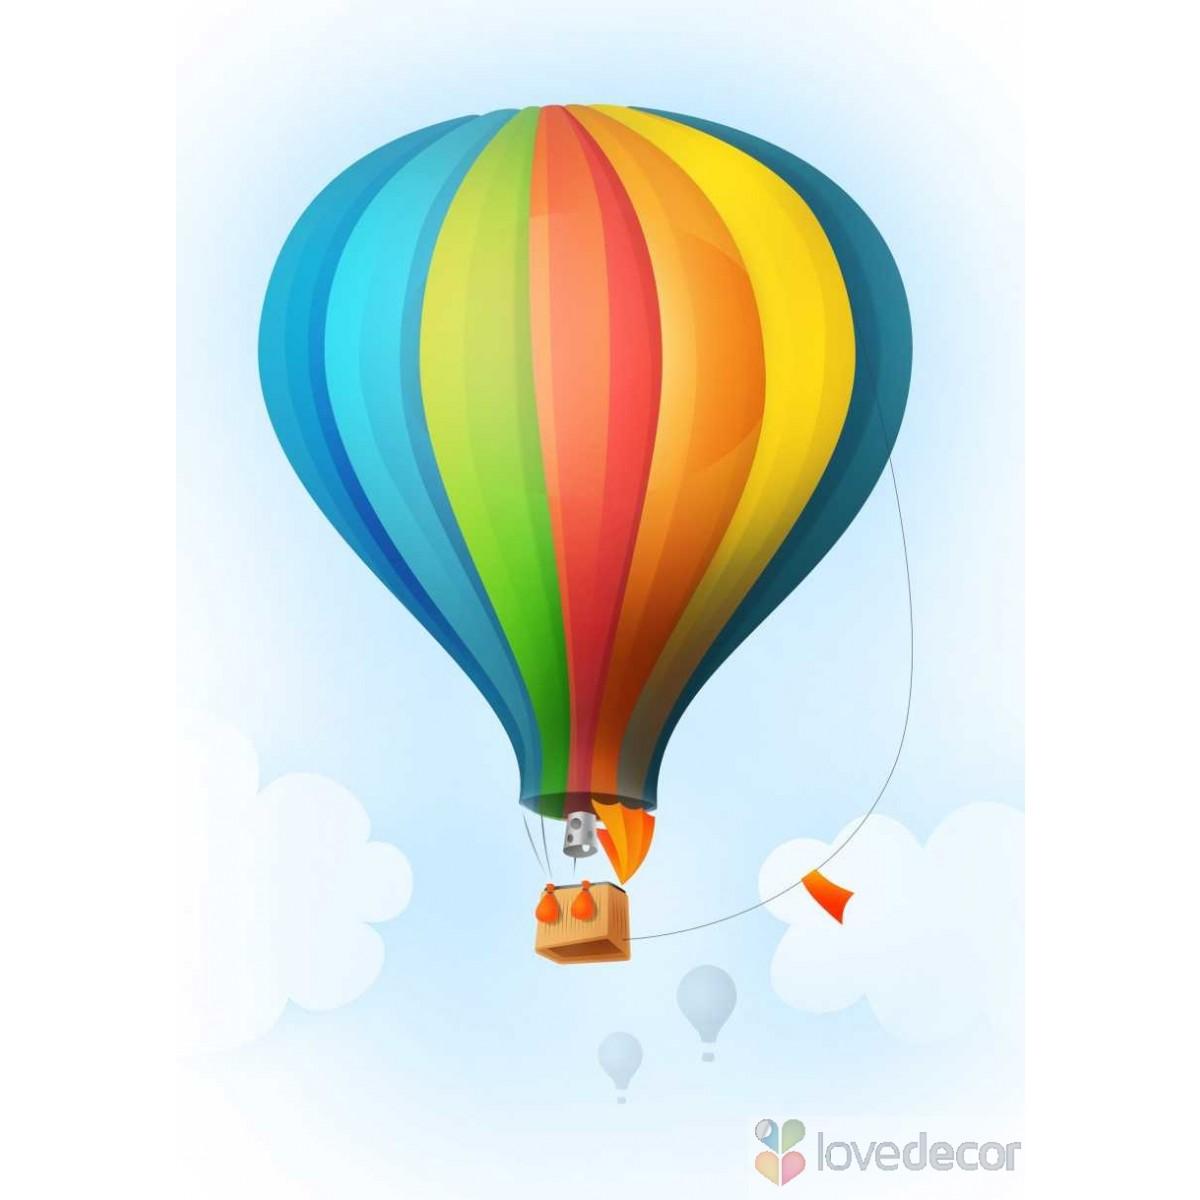 1200x1200 Wallpaper Clipart Hot Air Balloon